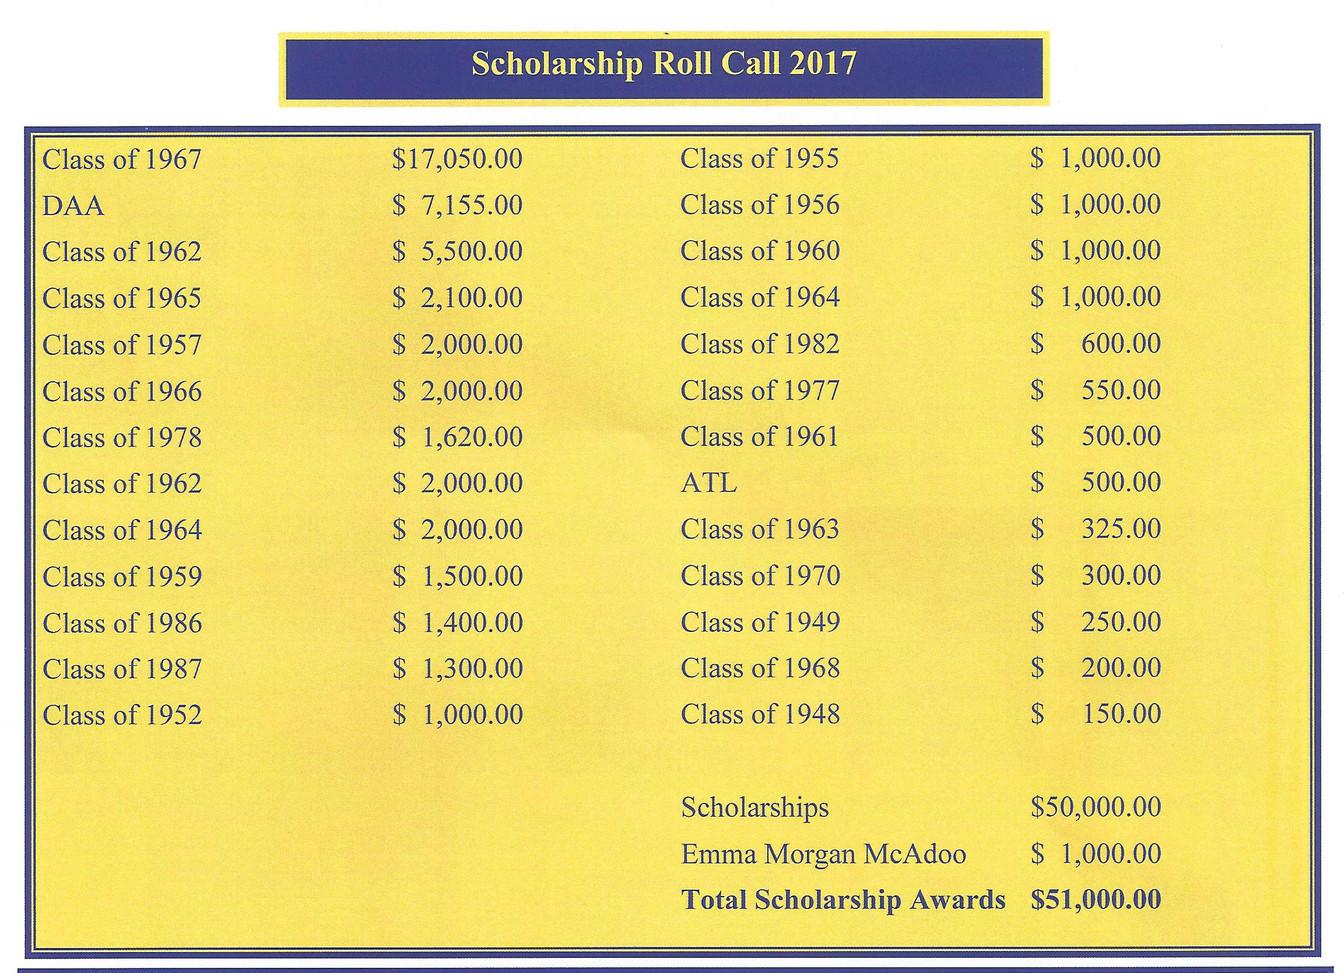 Roll Call 2017